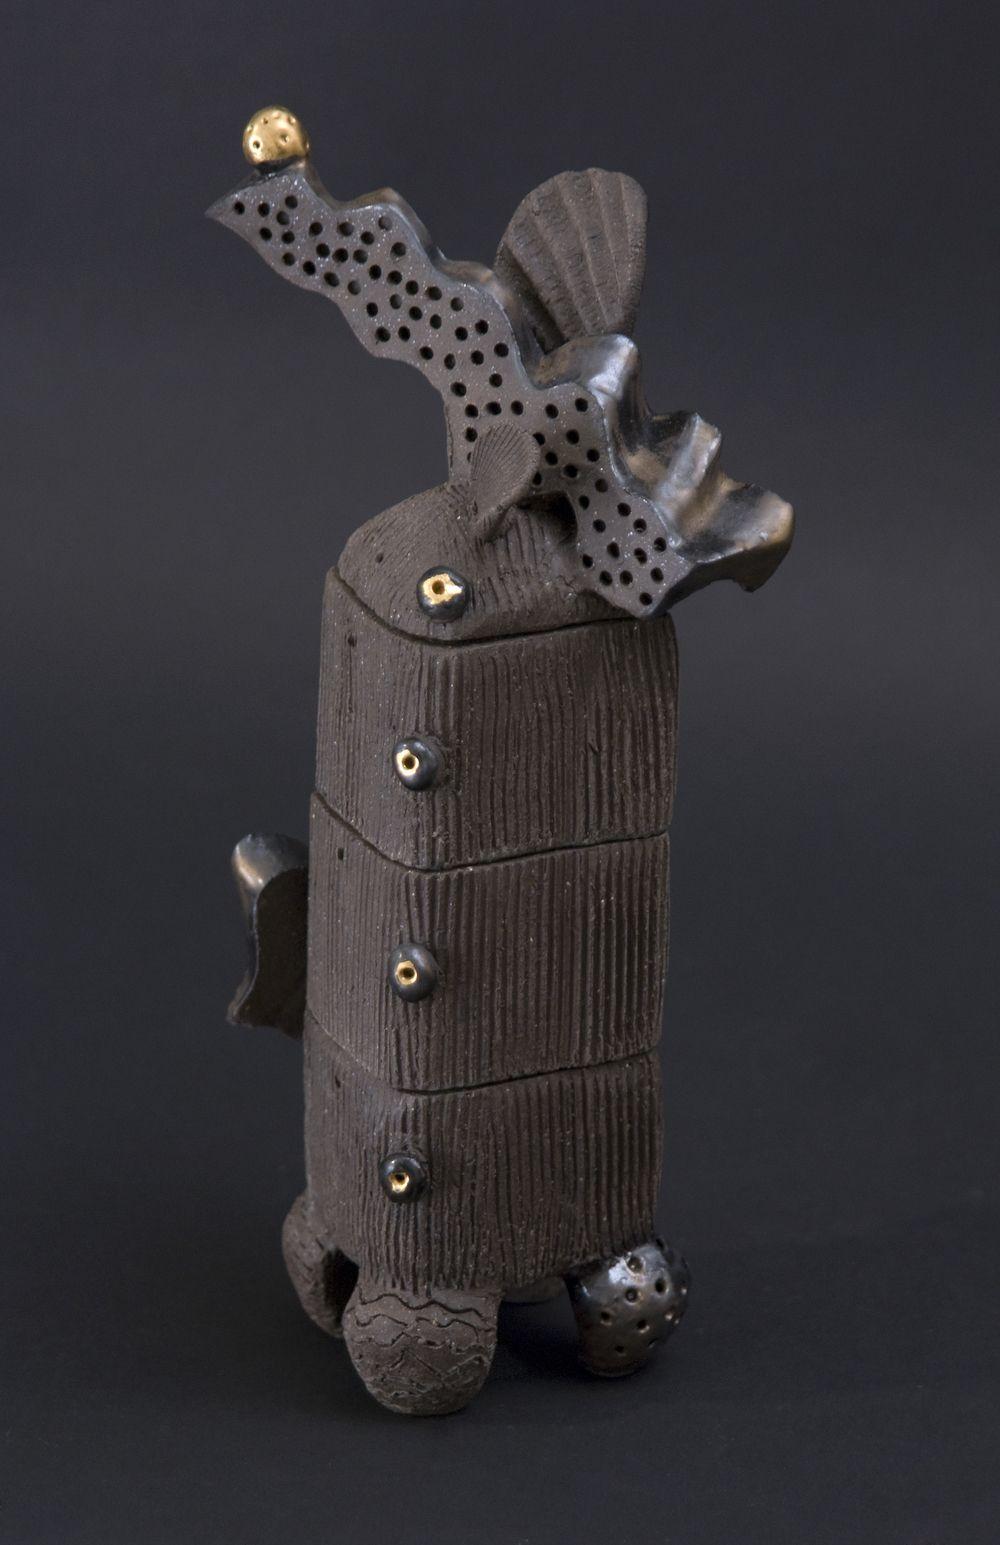 Akiko Tanaka Oju Box 2010 Porcelana de alta fuego, vidrio, brillo de oro 3 x 2.5 x 8 pulgadas & nbsp; / & nbsp; 7,6 x 6,4 x 20,3 cm & nbsp; / & nbsp; 10 ATA